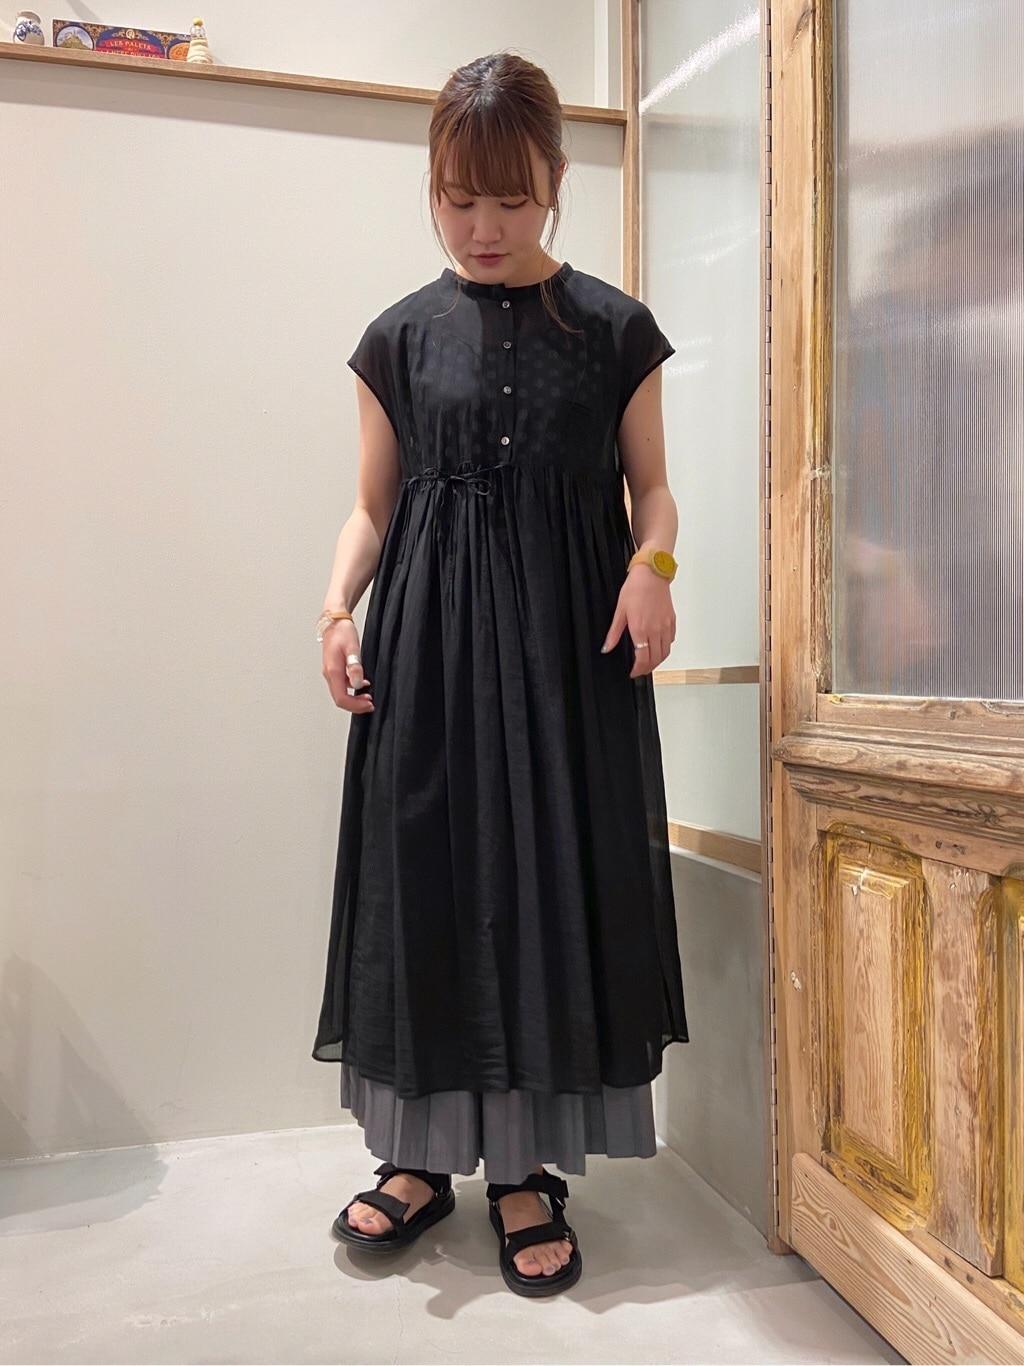 bulle de savon 渋谷スクランブルスクエア 身長:160cm 2020.07.11